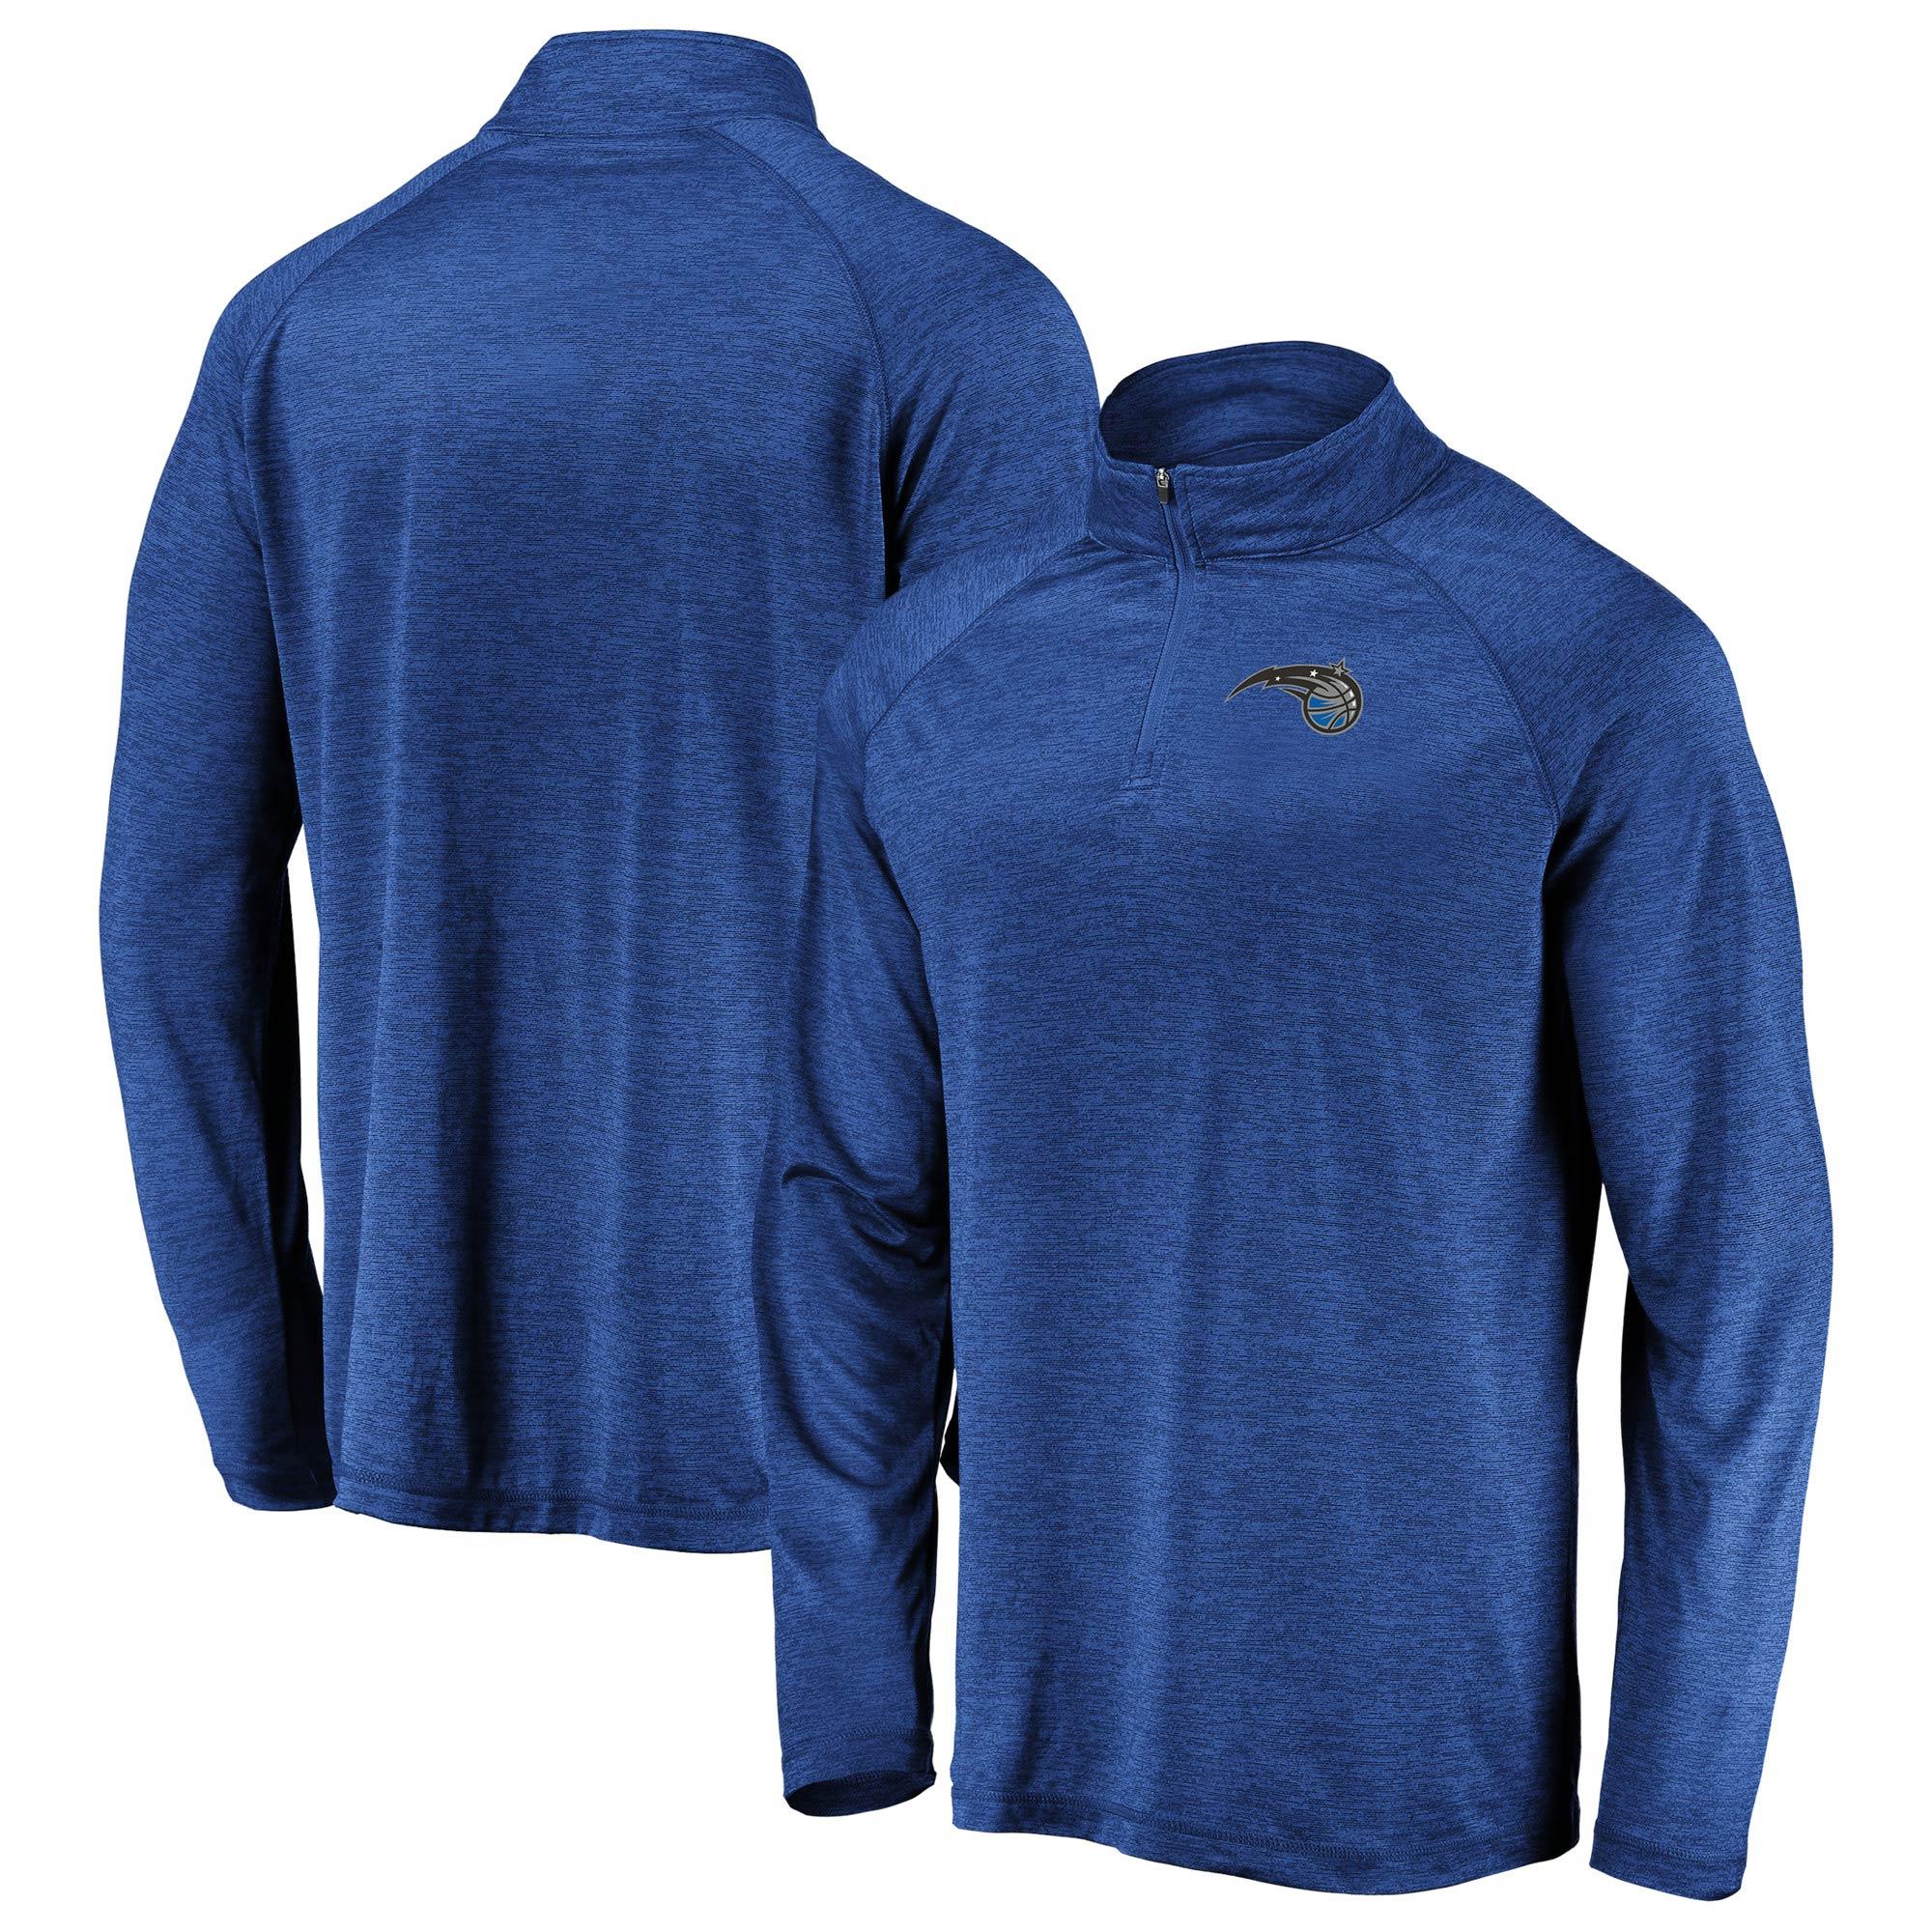 Orlando Magic Fanatics Branded Iconic Striated Raglan Quarter-Zip Pullover Jacket - Blue